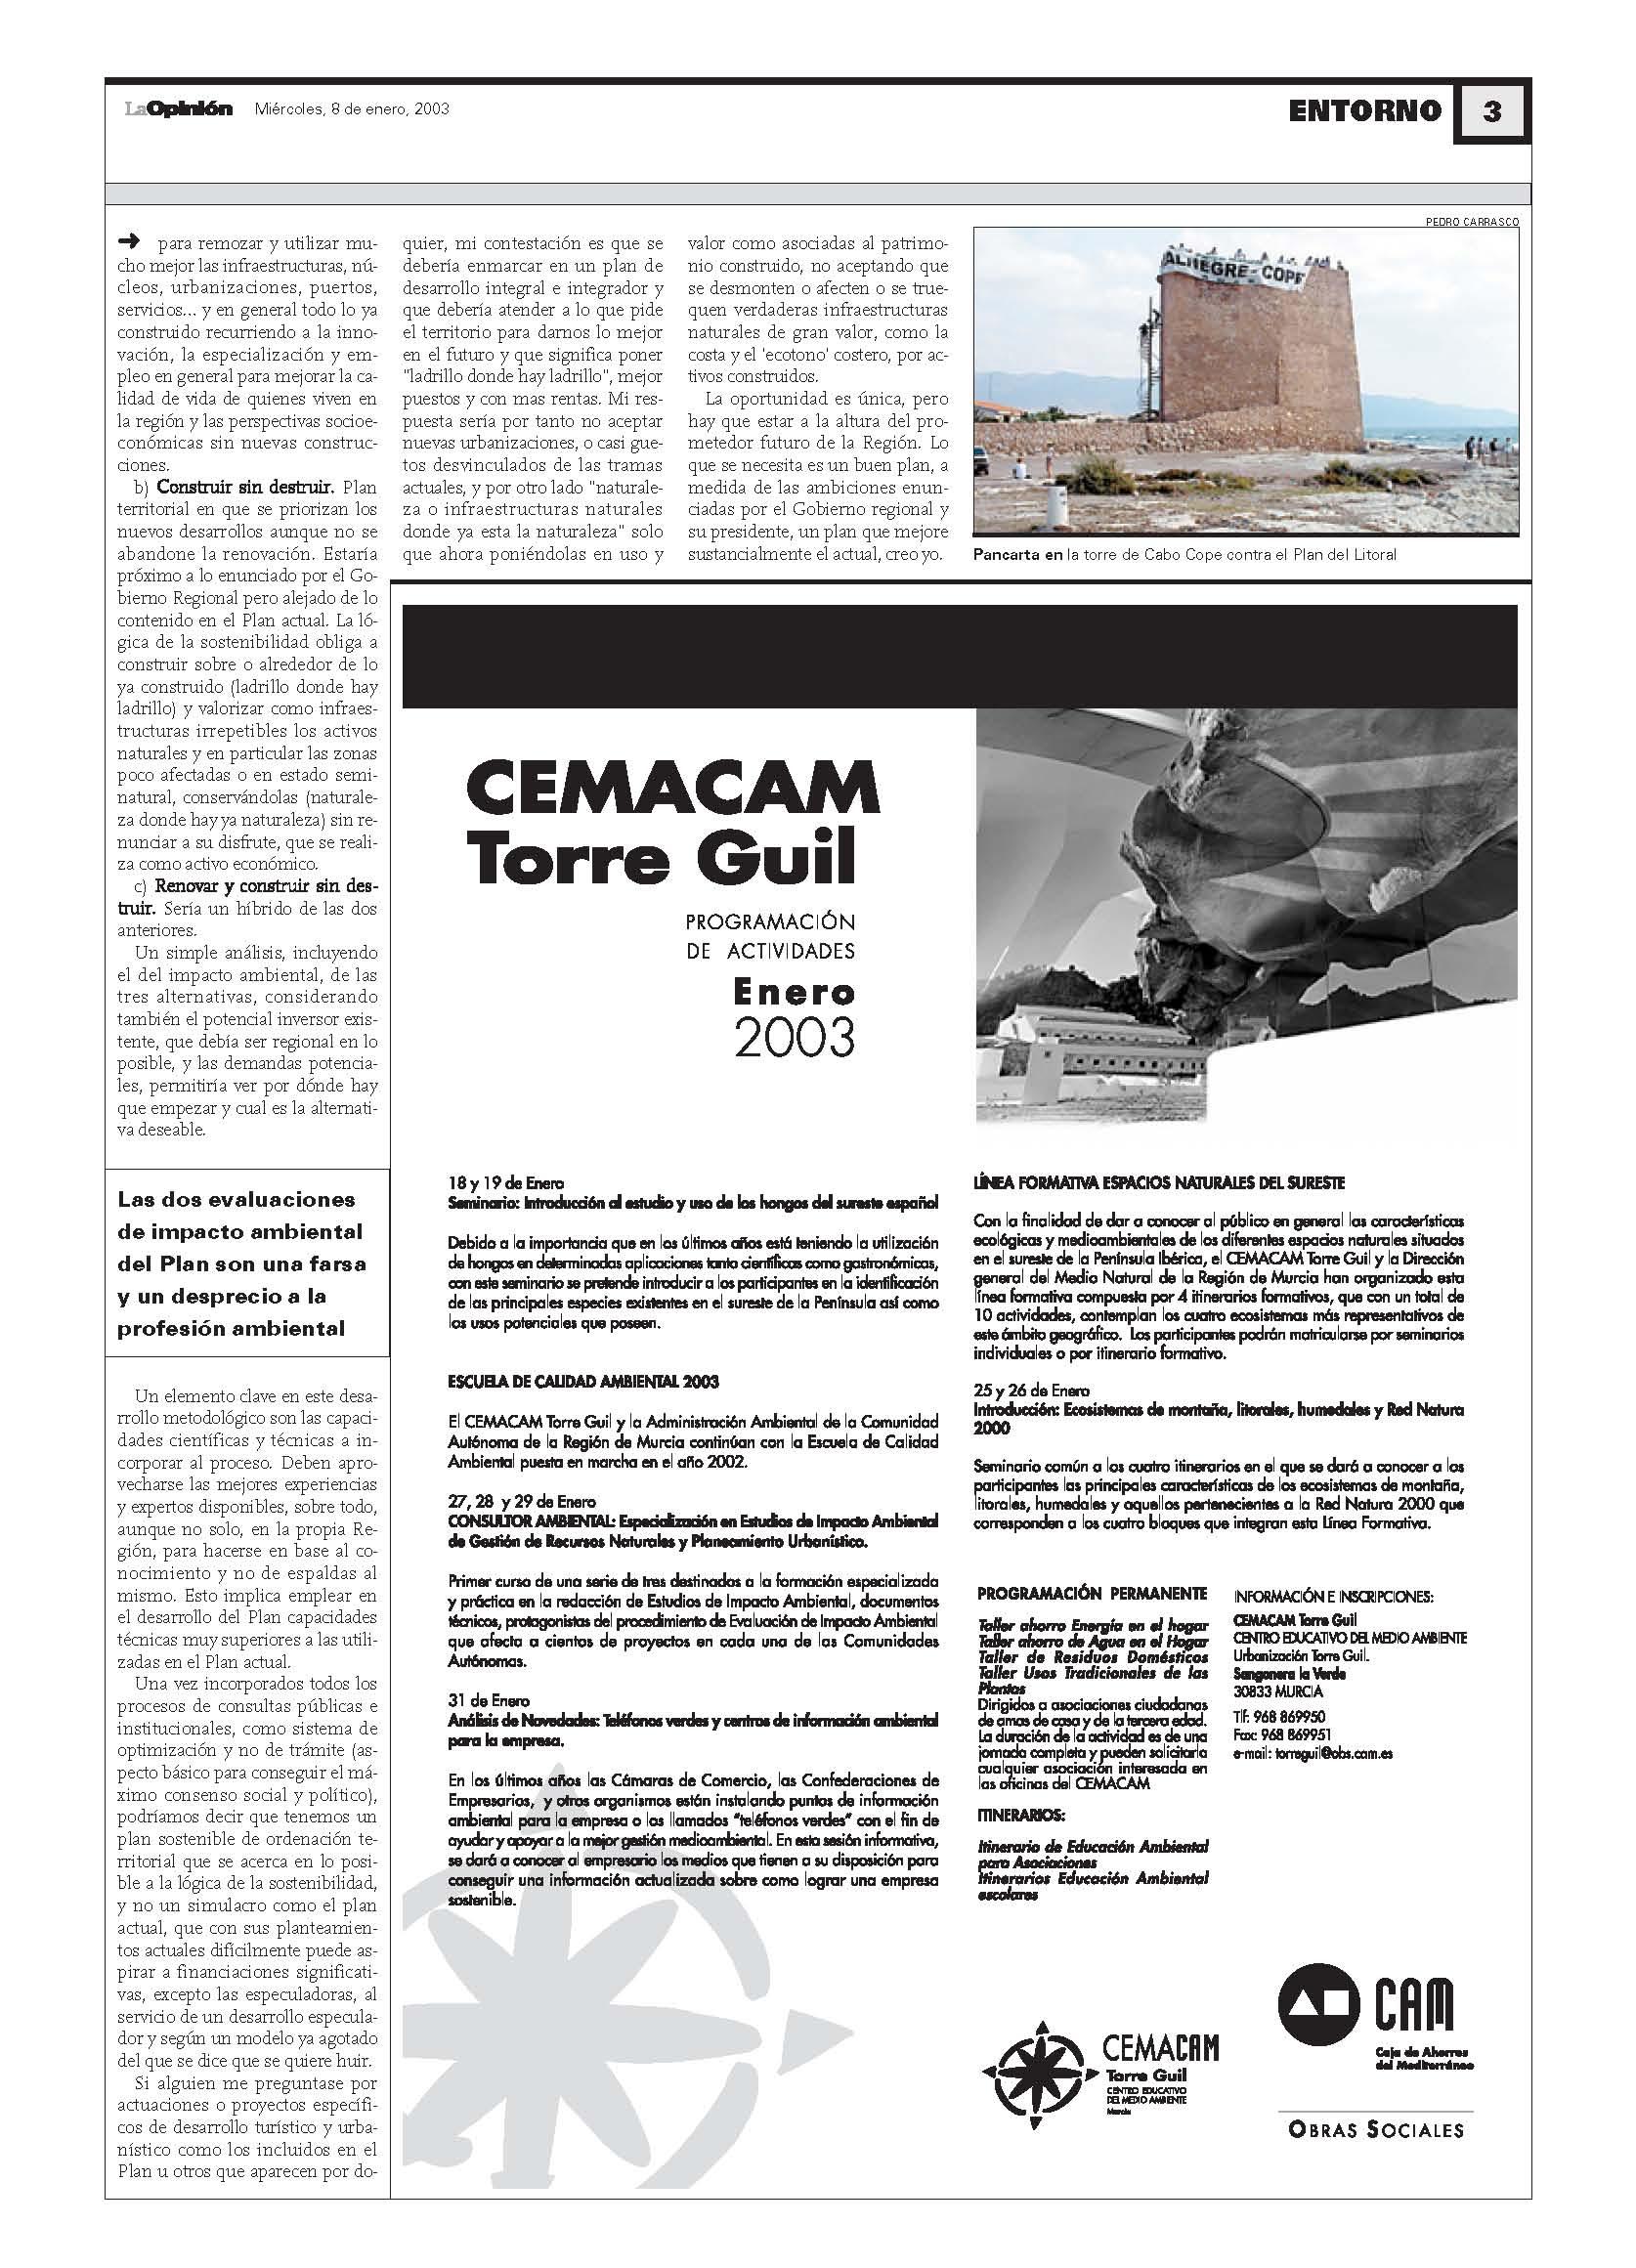 2003 01 07-PLAN LITORAL-LA OPINION 2